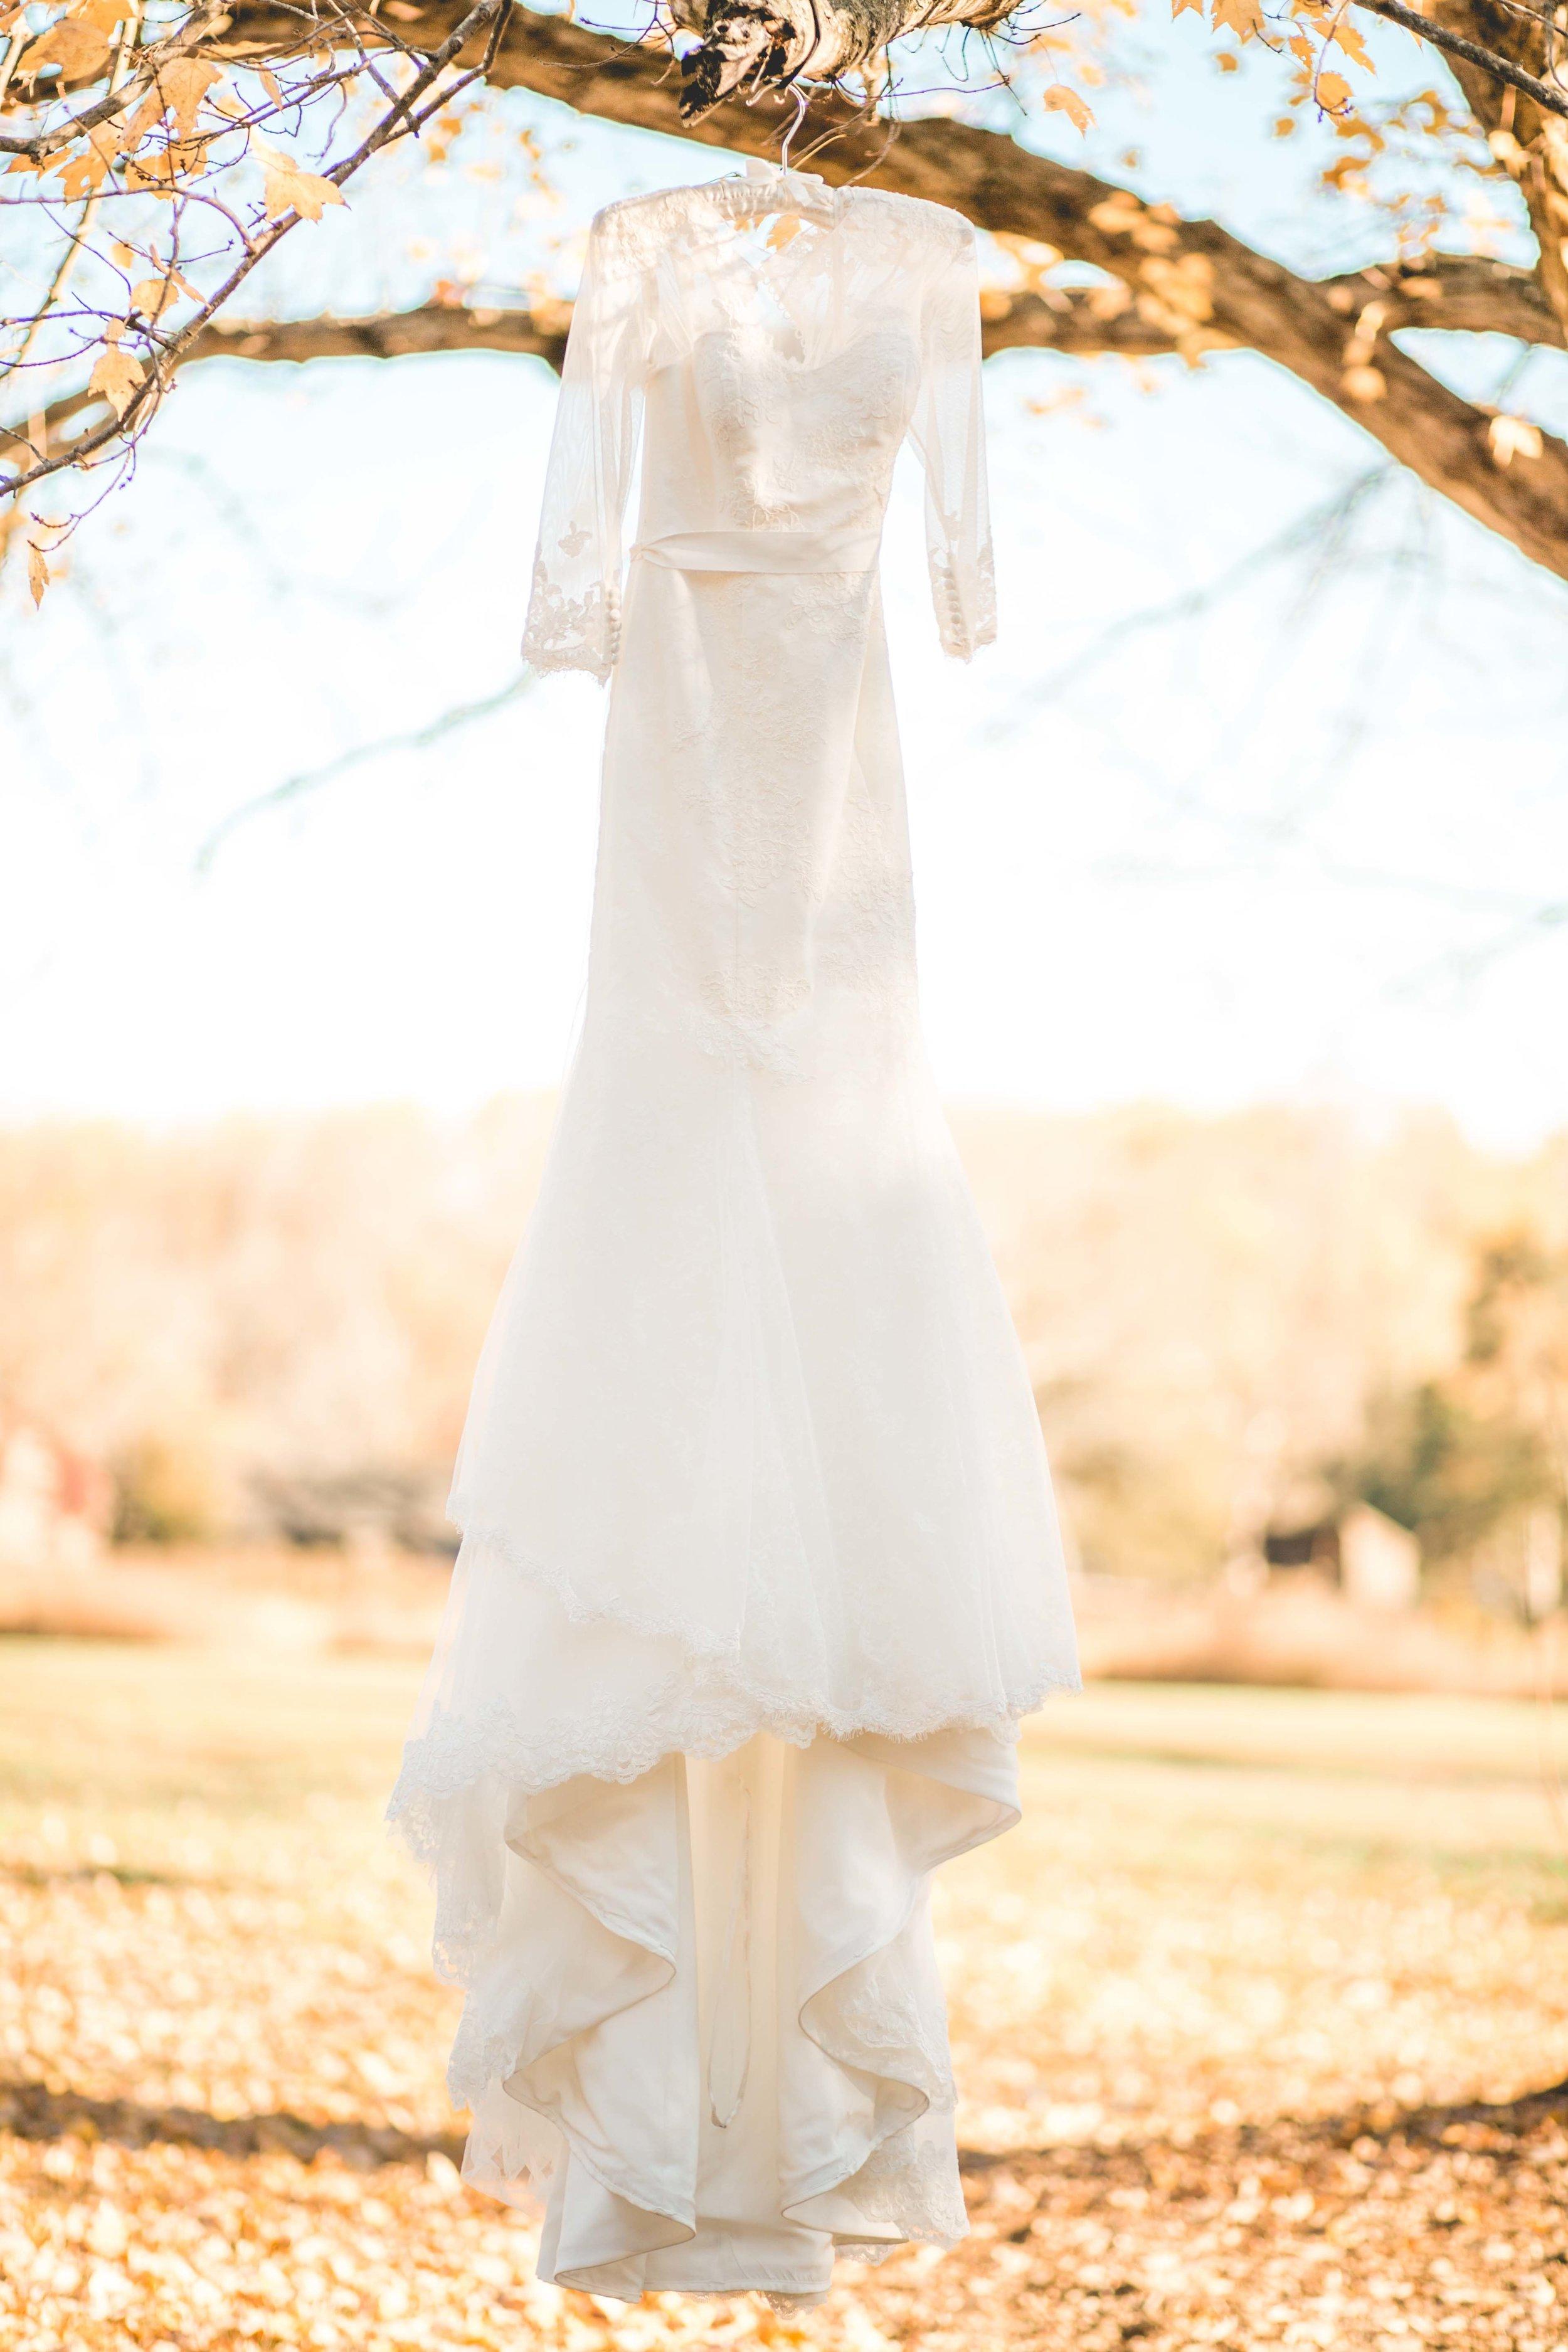 1.   NEW HOPE OUTDOOR WEDDING PHOTOS | ELEGANT PHOTOGRAPHY